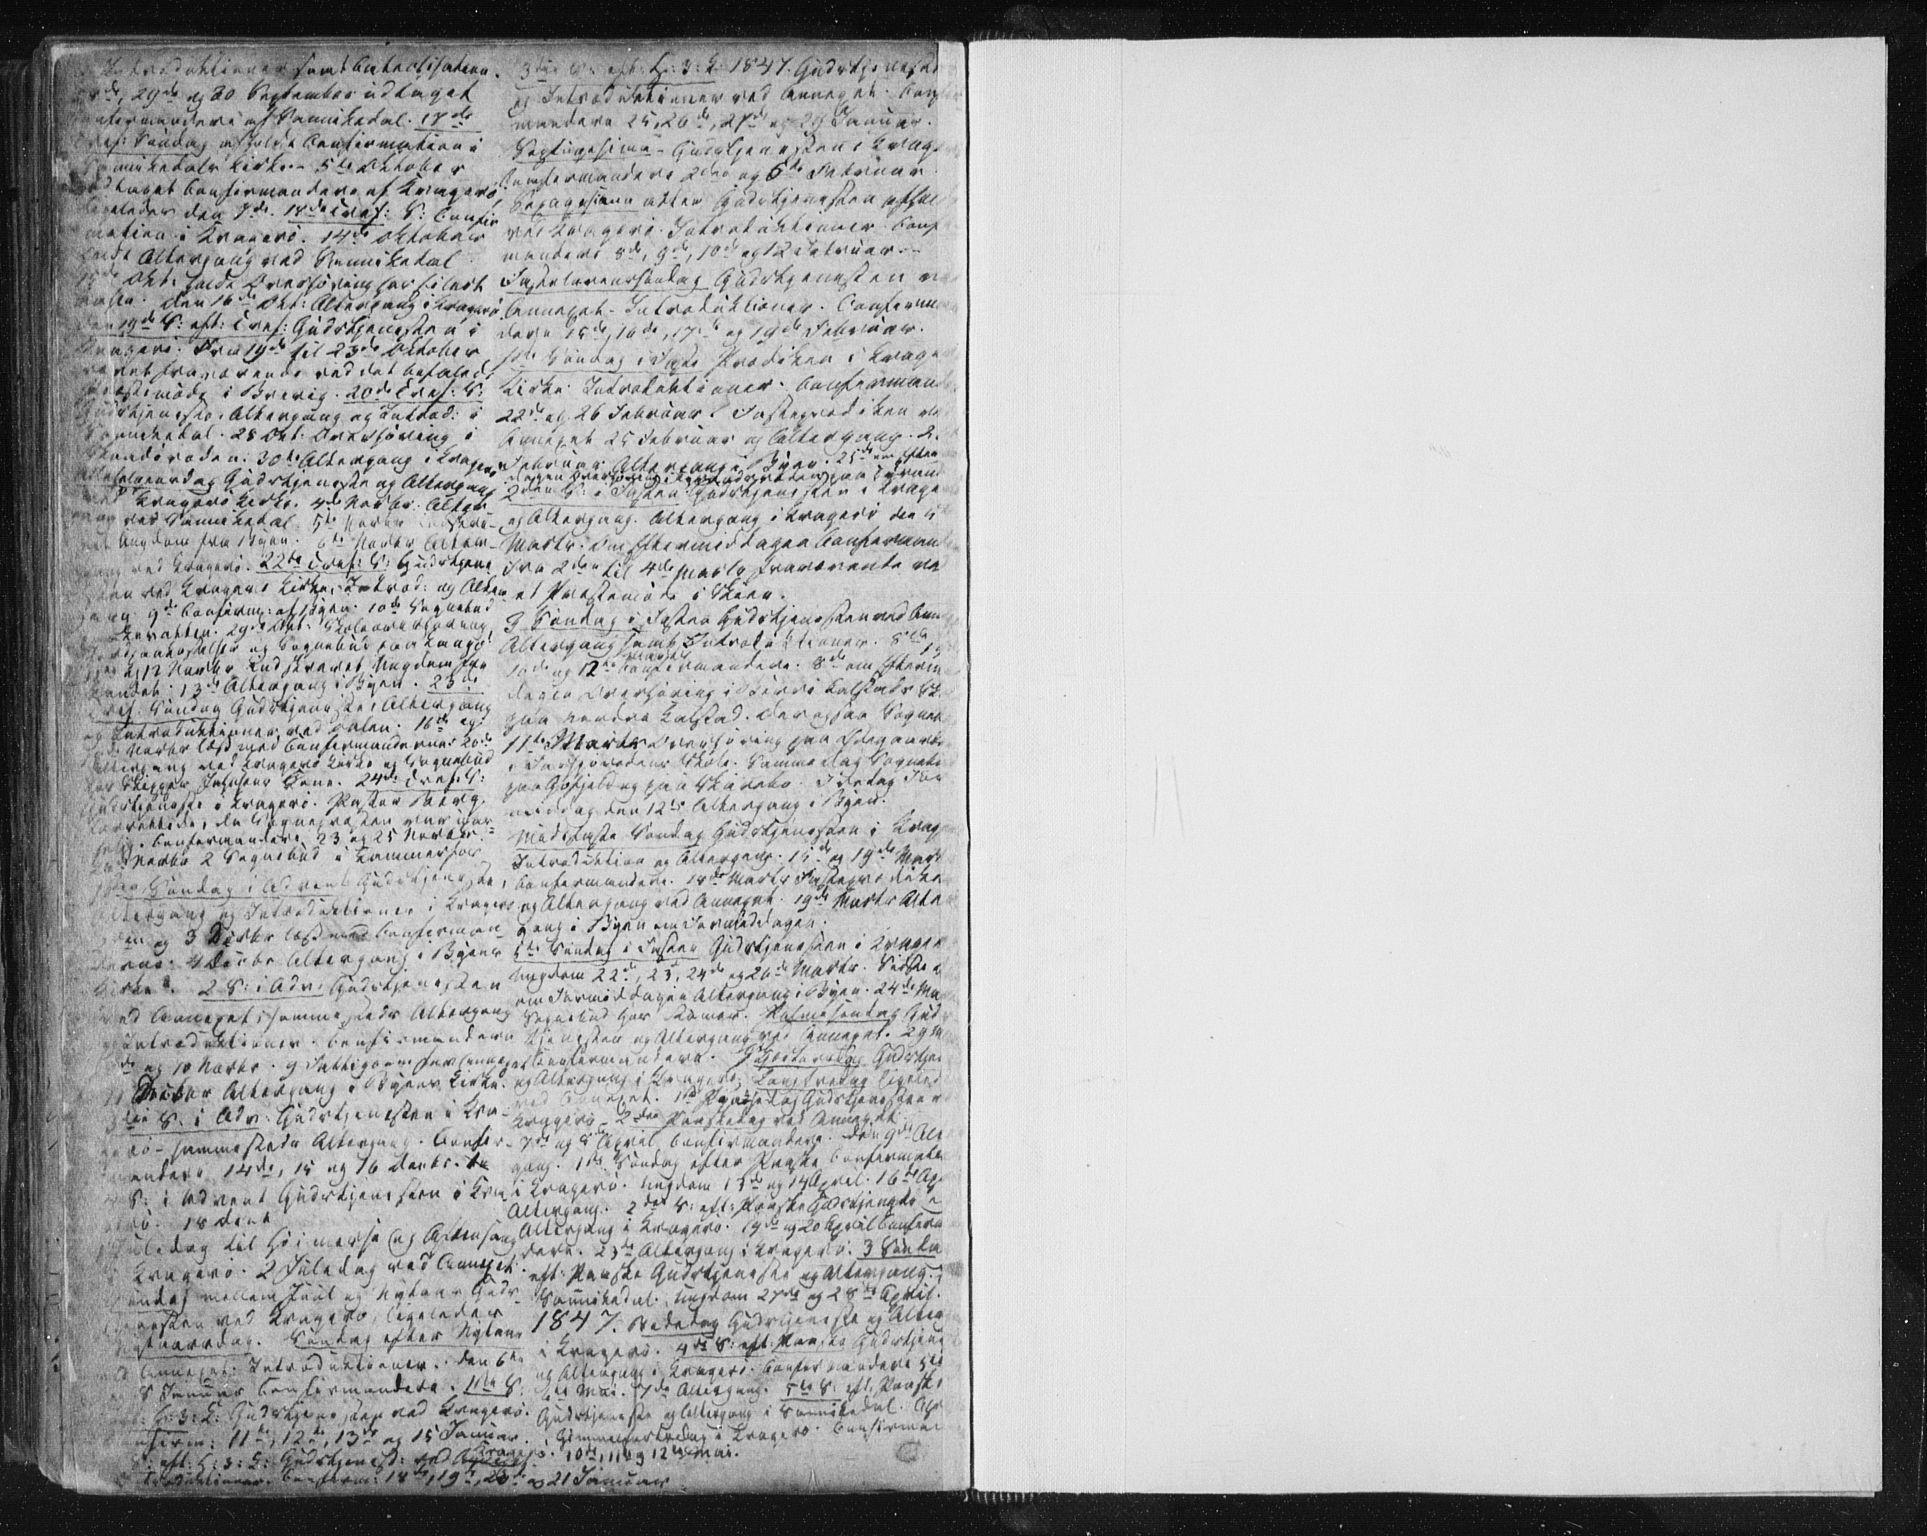 SAKO, Kragerø kirkebøker, F/Fa/L0005: Ministerialbok nr. 5, 1832-1847, s. 284